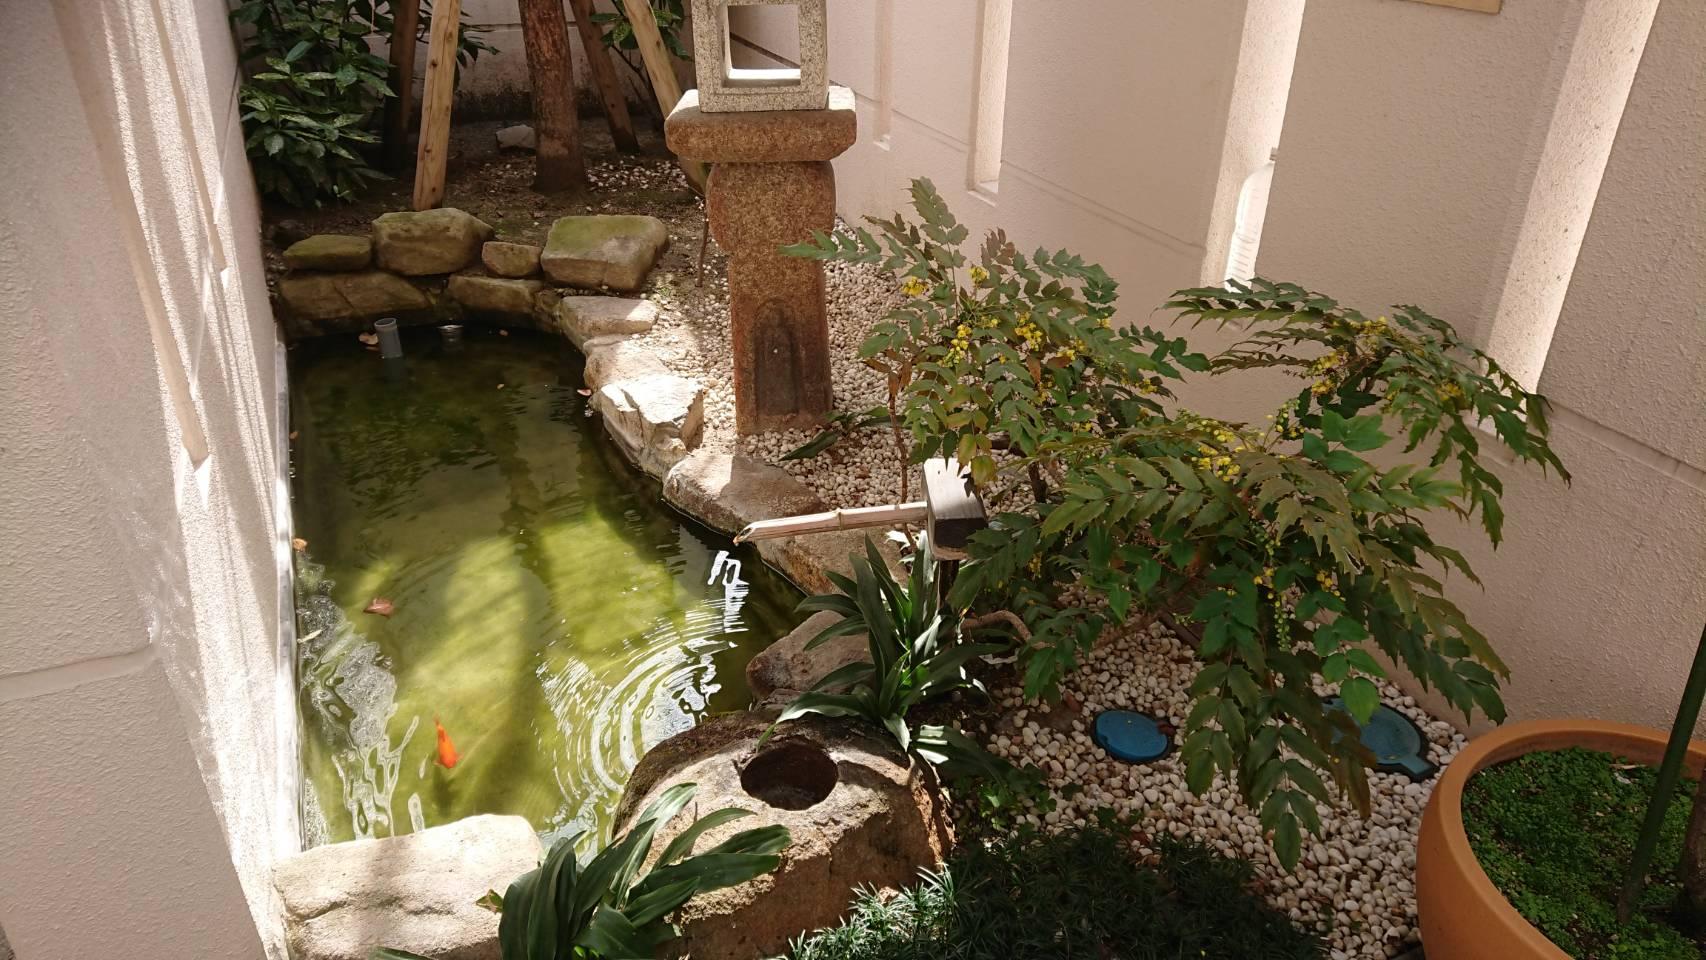 専光寺墓苑の庭苑